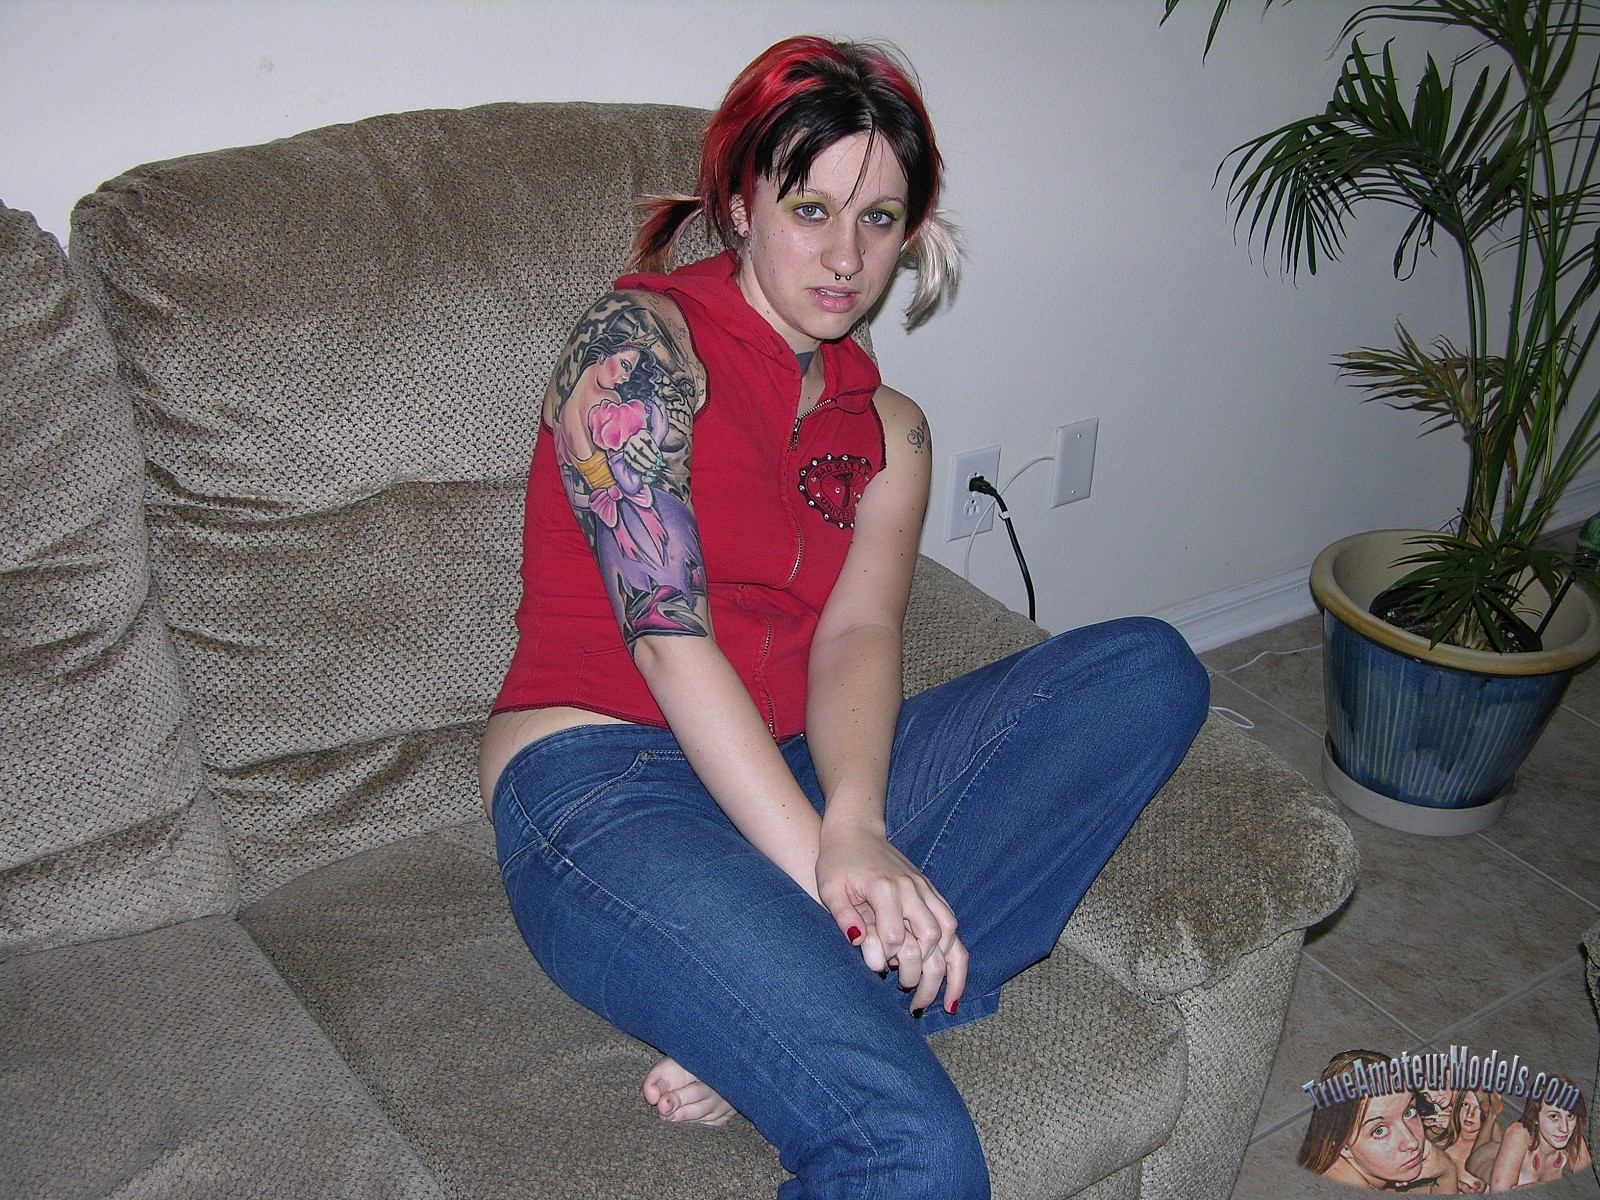 punk-rock-girls-porn